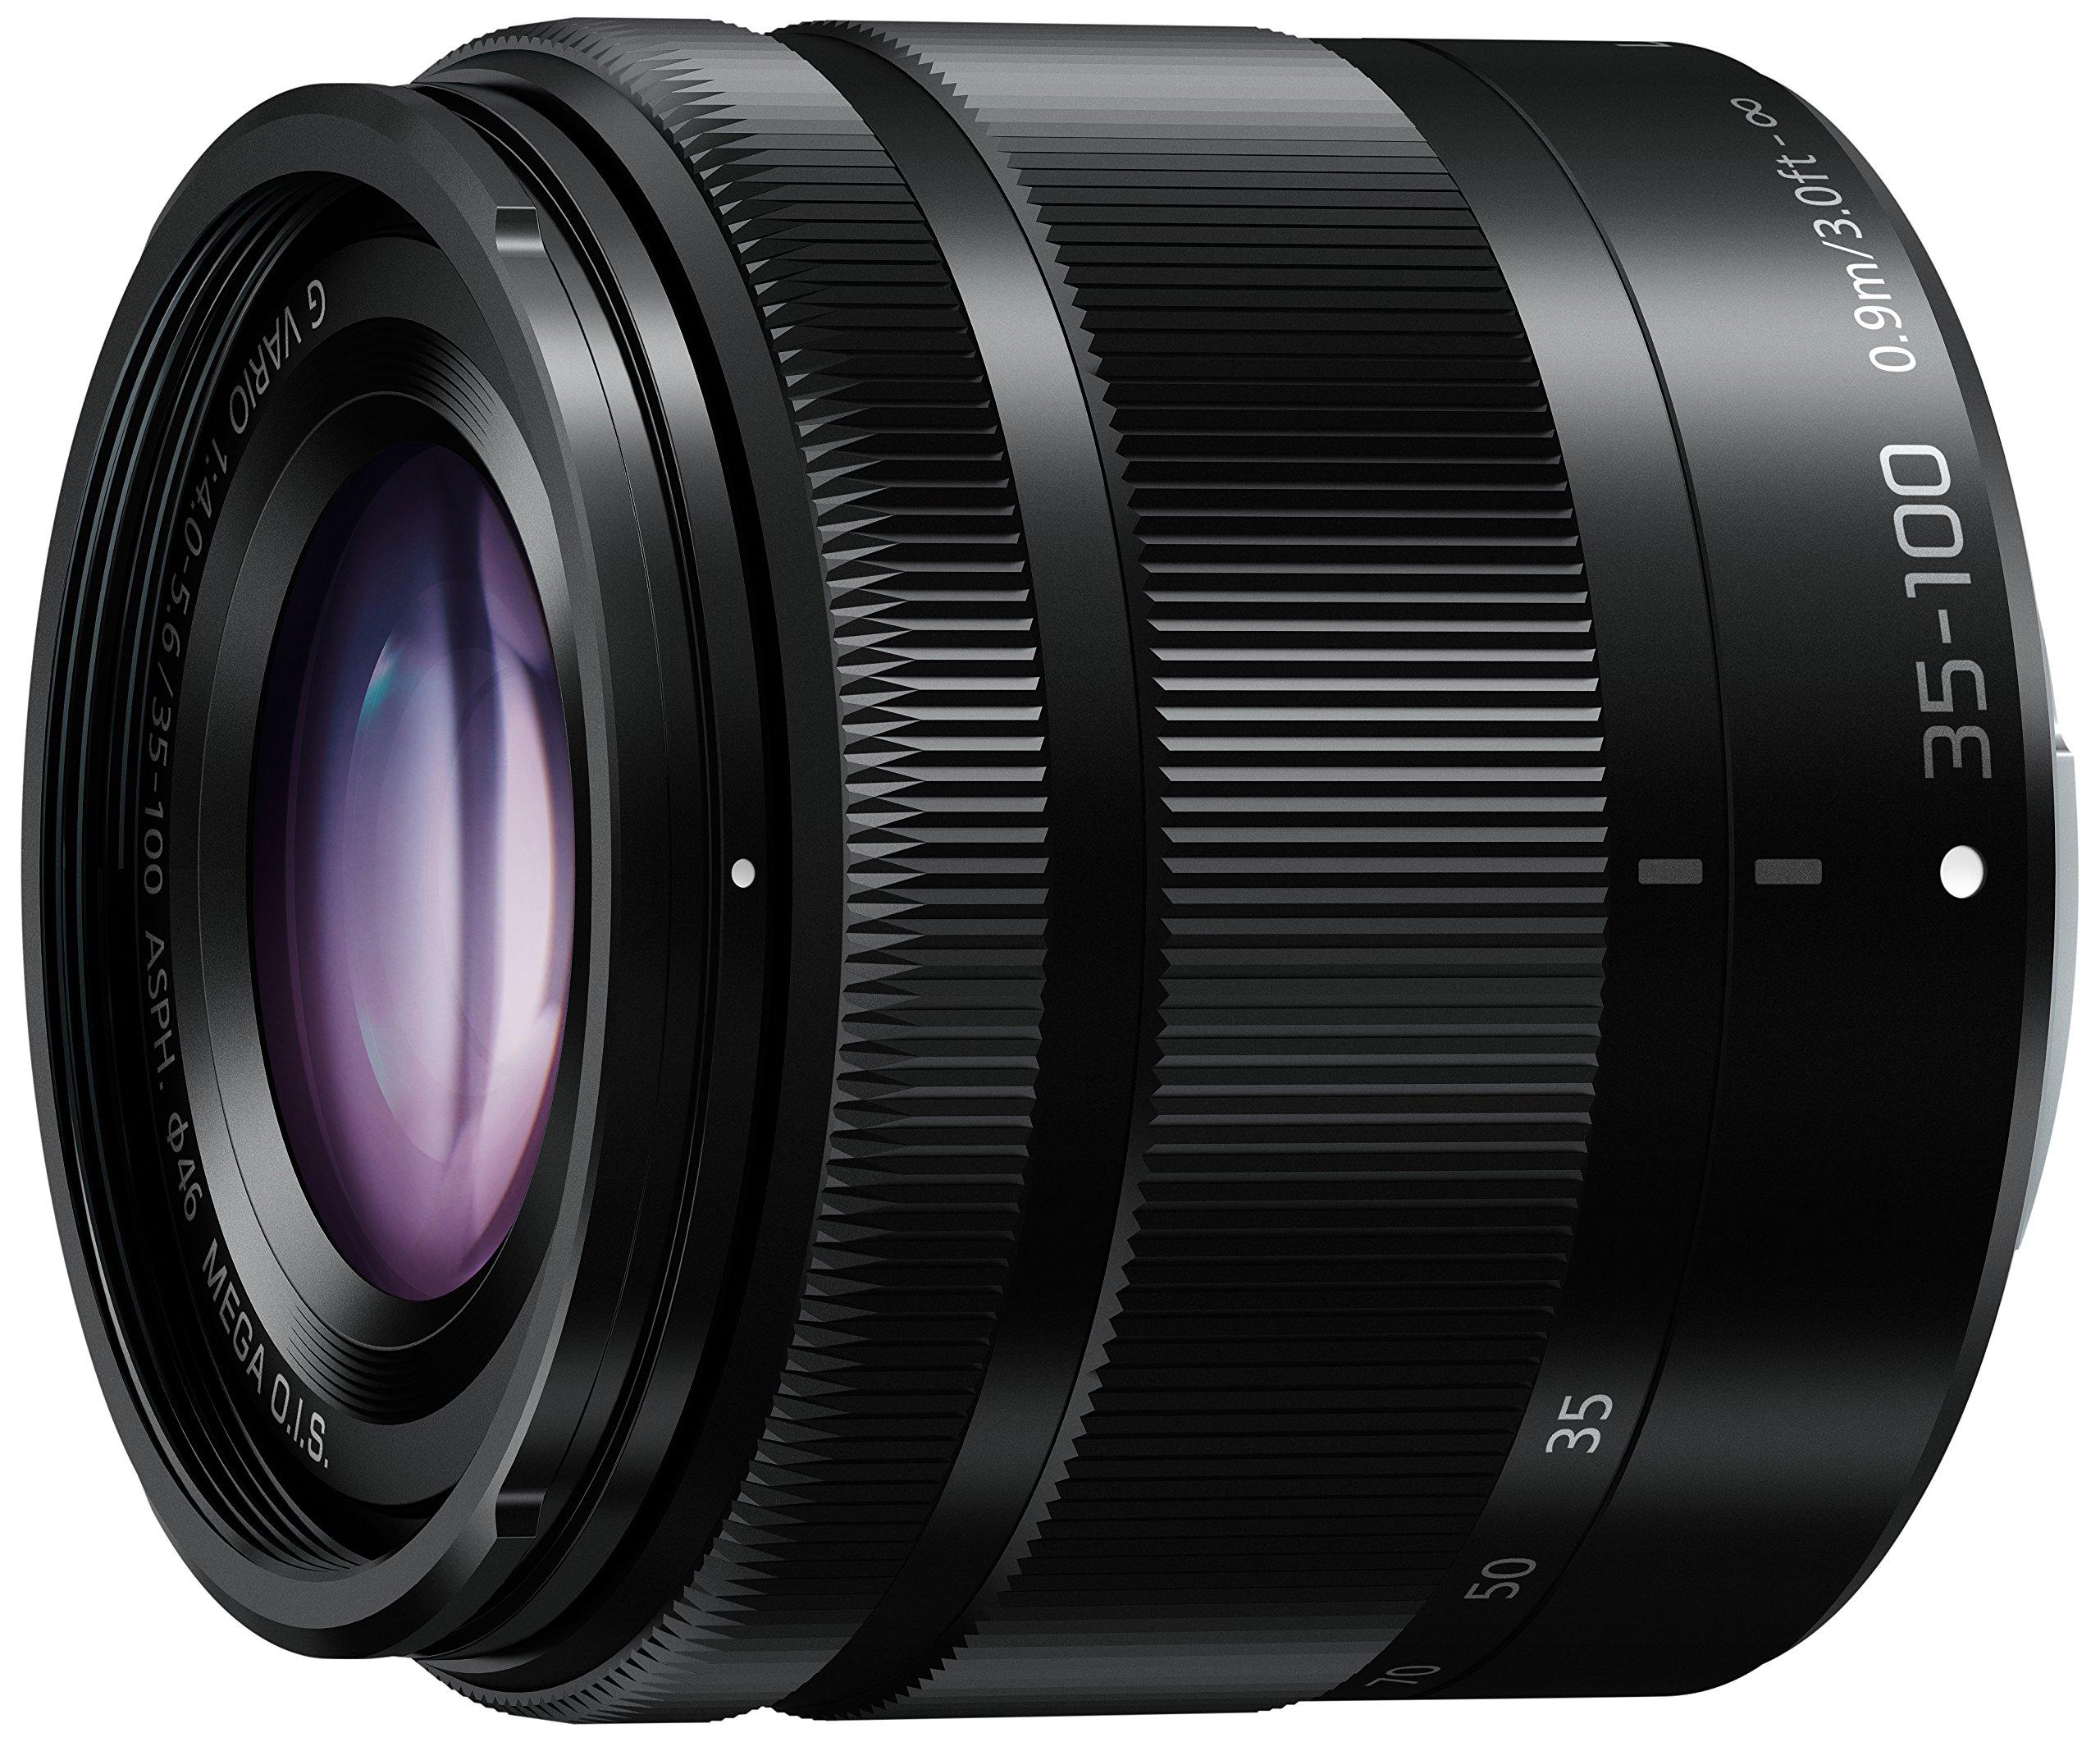 Panasonic Gx85 Lumix Gx85k Lensa 12 32mm Kamera Dmc G Vario Lens 35 100mm F40 56 Asph